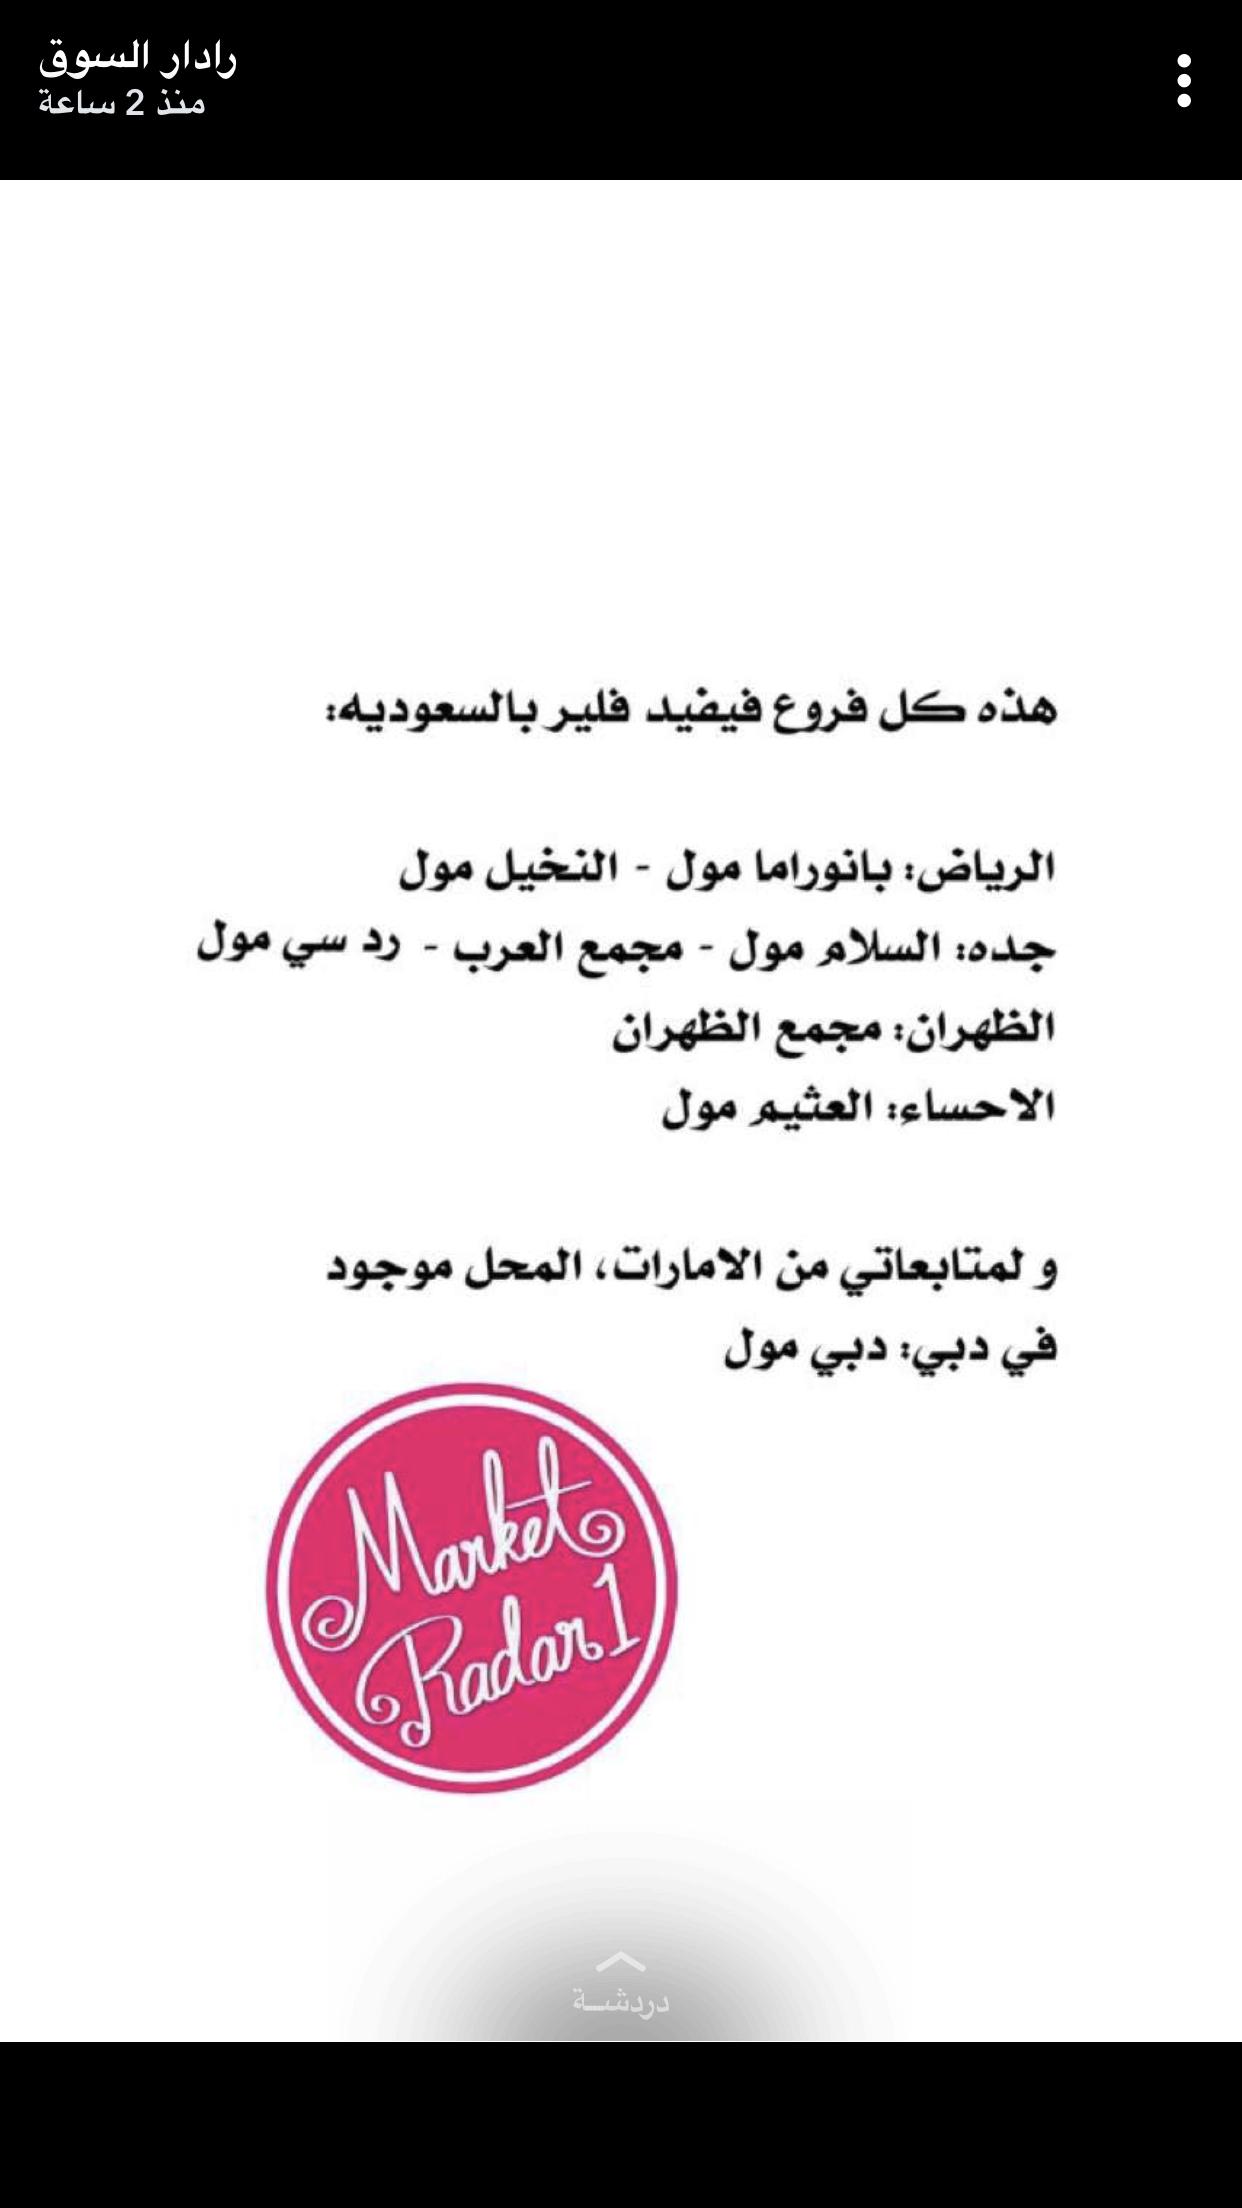 Pin By Noonwteen On فروع المحلات Calligraphy Arabic Calligraphy Arabic